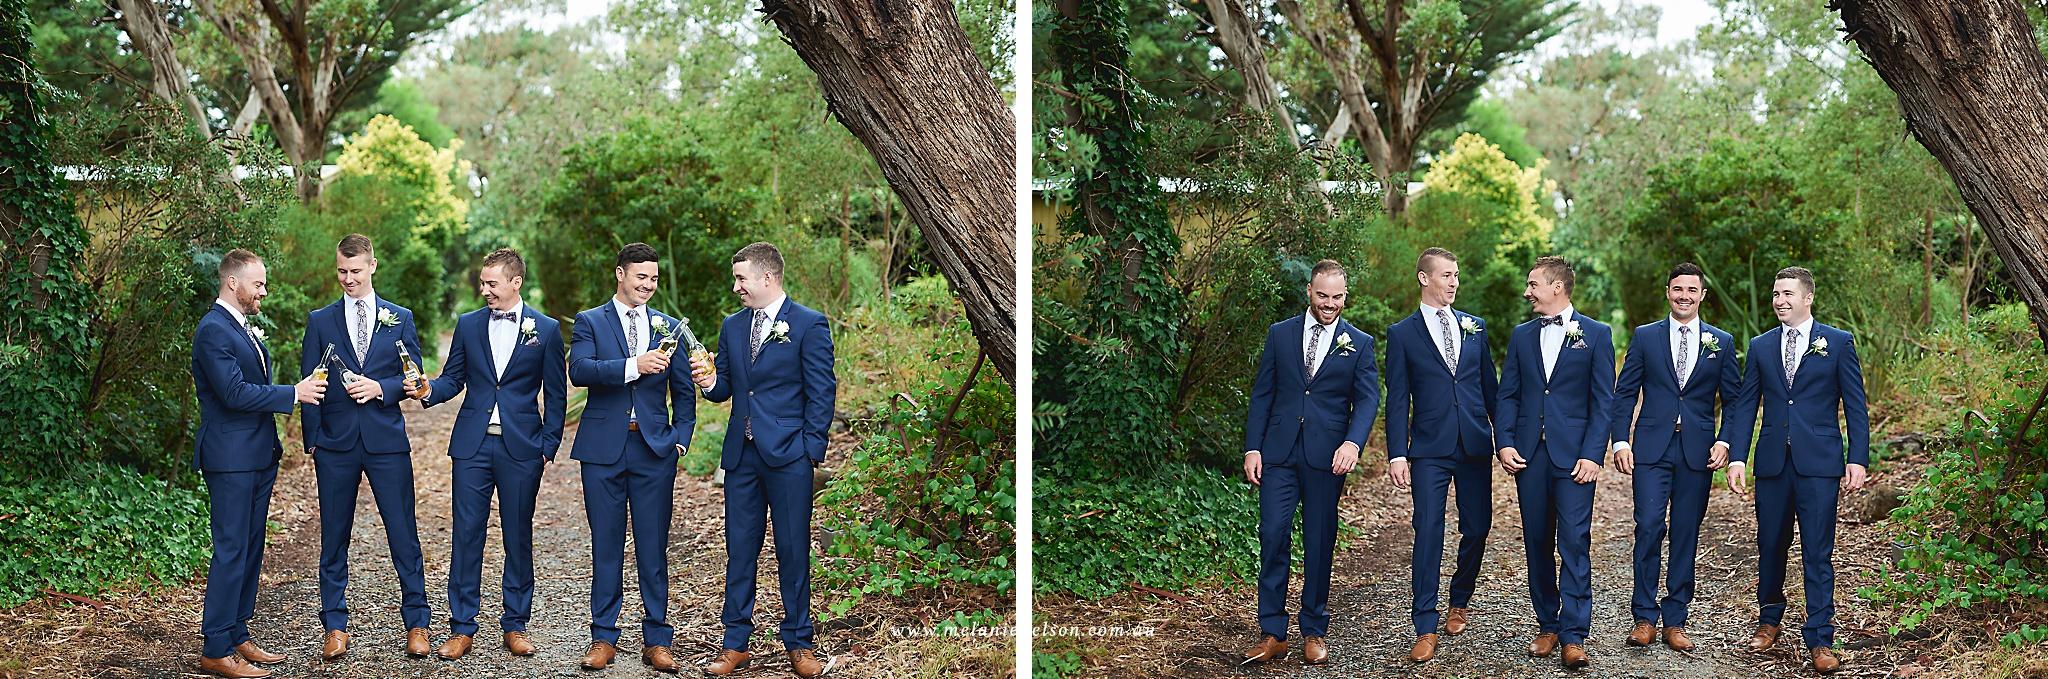 serafino_wedding_photography_0006.jpg